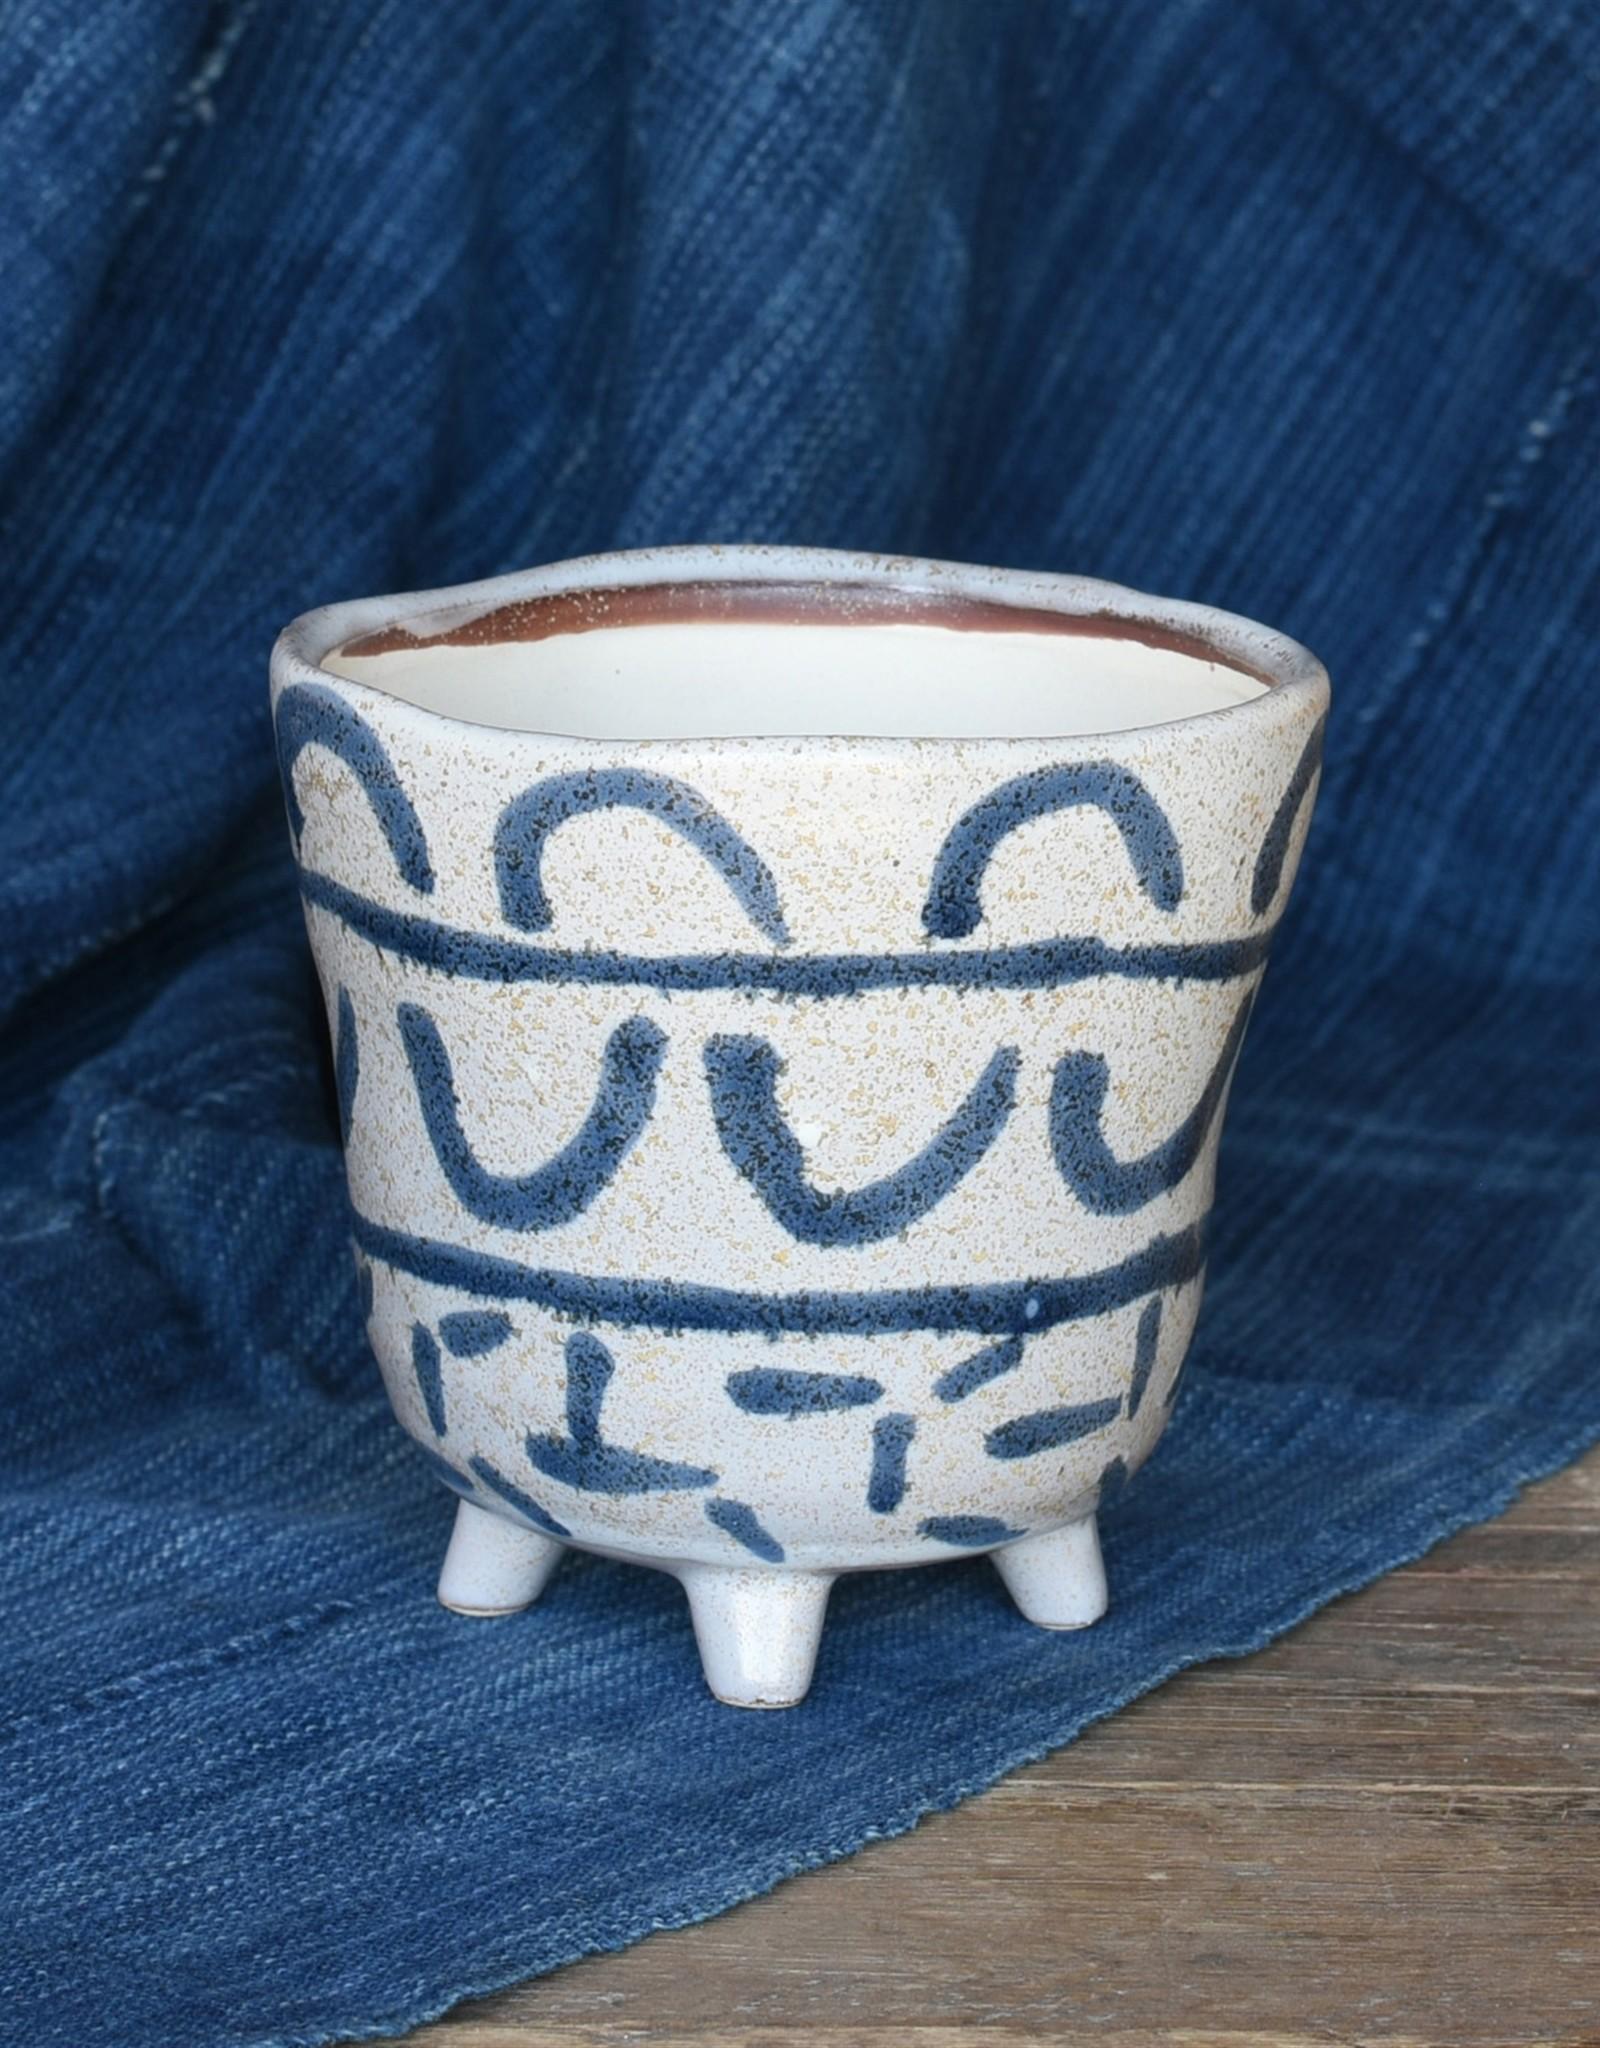 HomArt Granada Painted Footed Bowl - Large